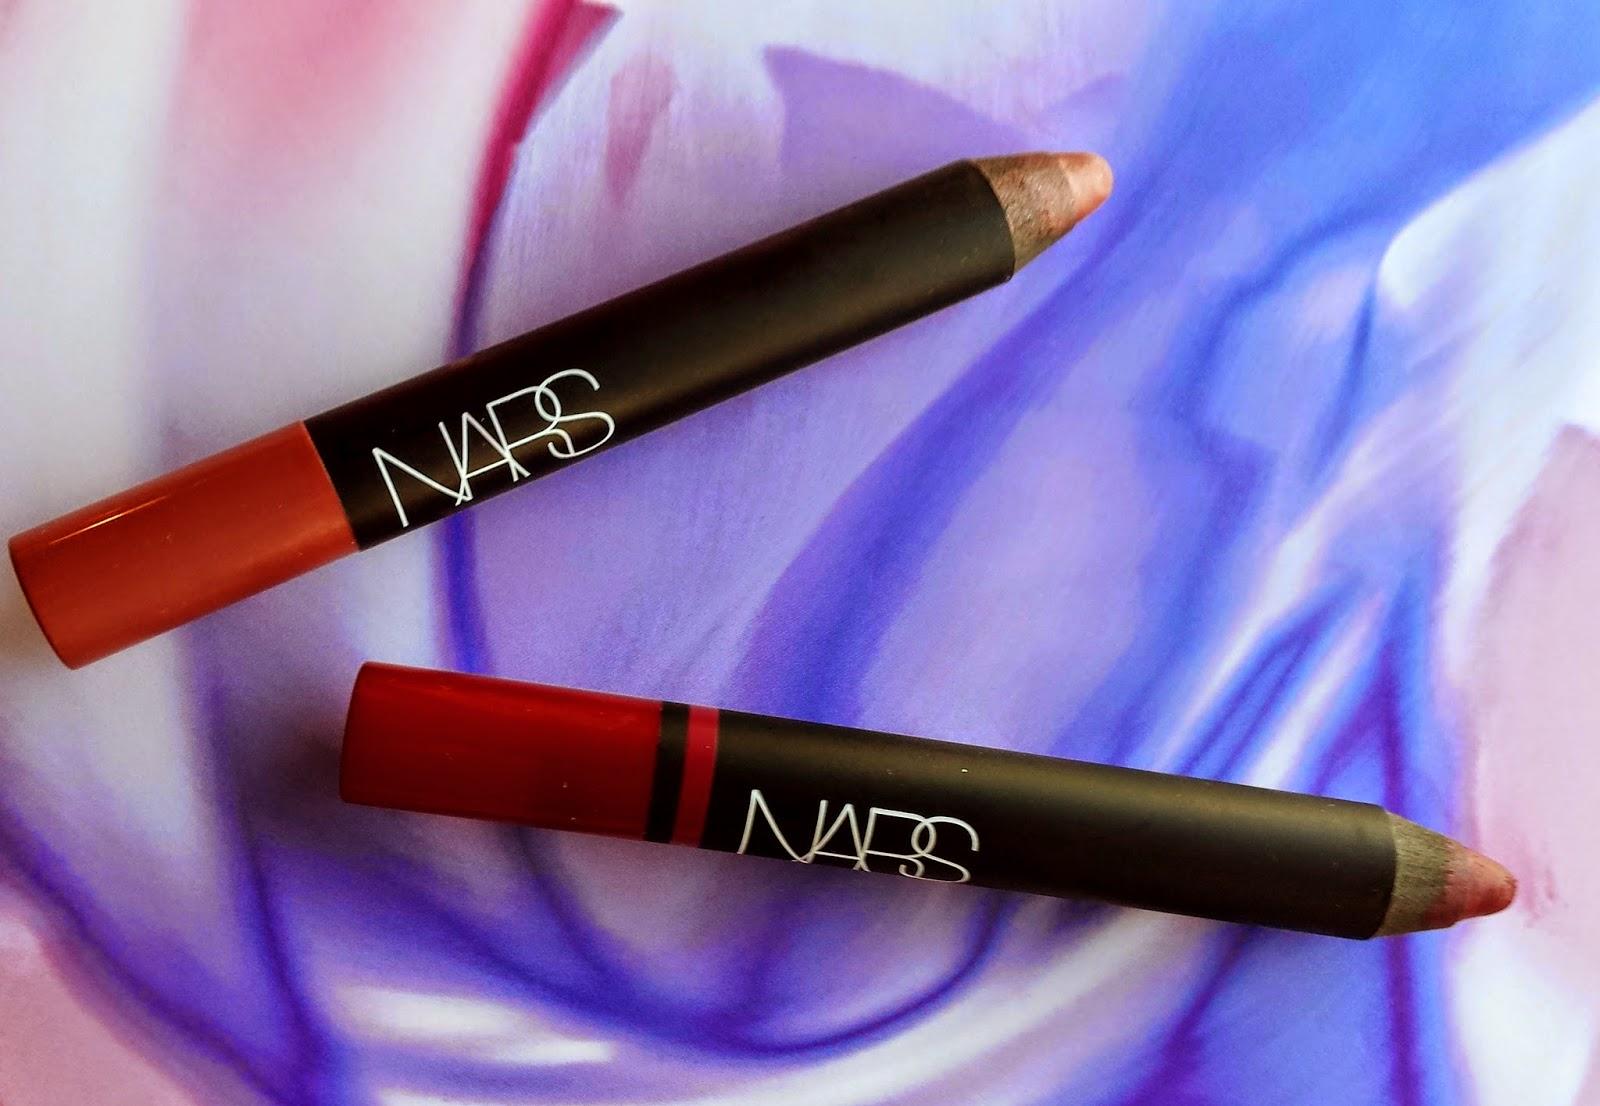 fabuleuse, toujours ¦ NARS Cosmetics Lip Pencils in Palais Royal and Bahama